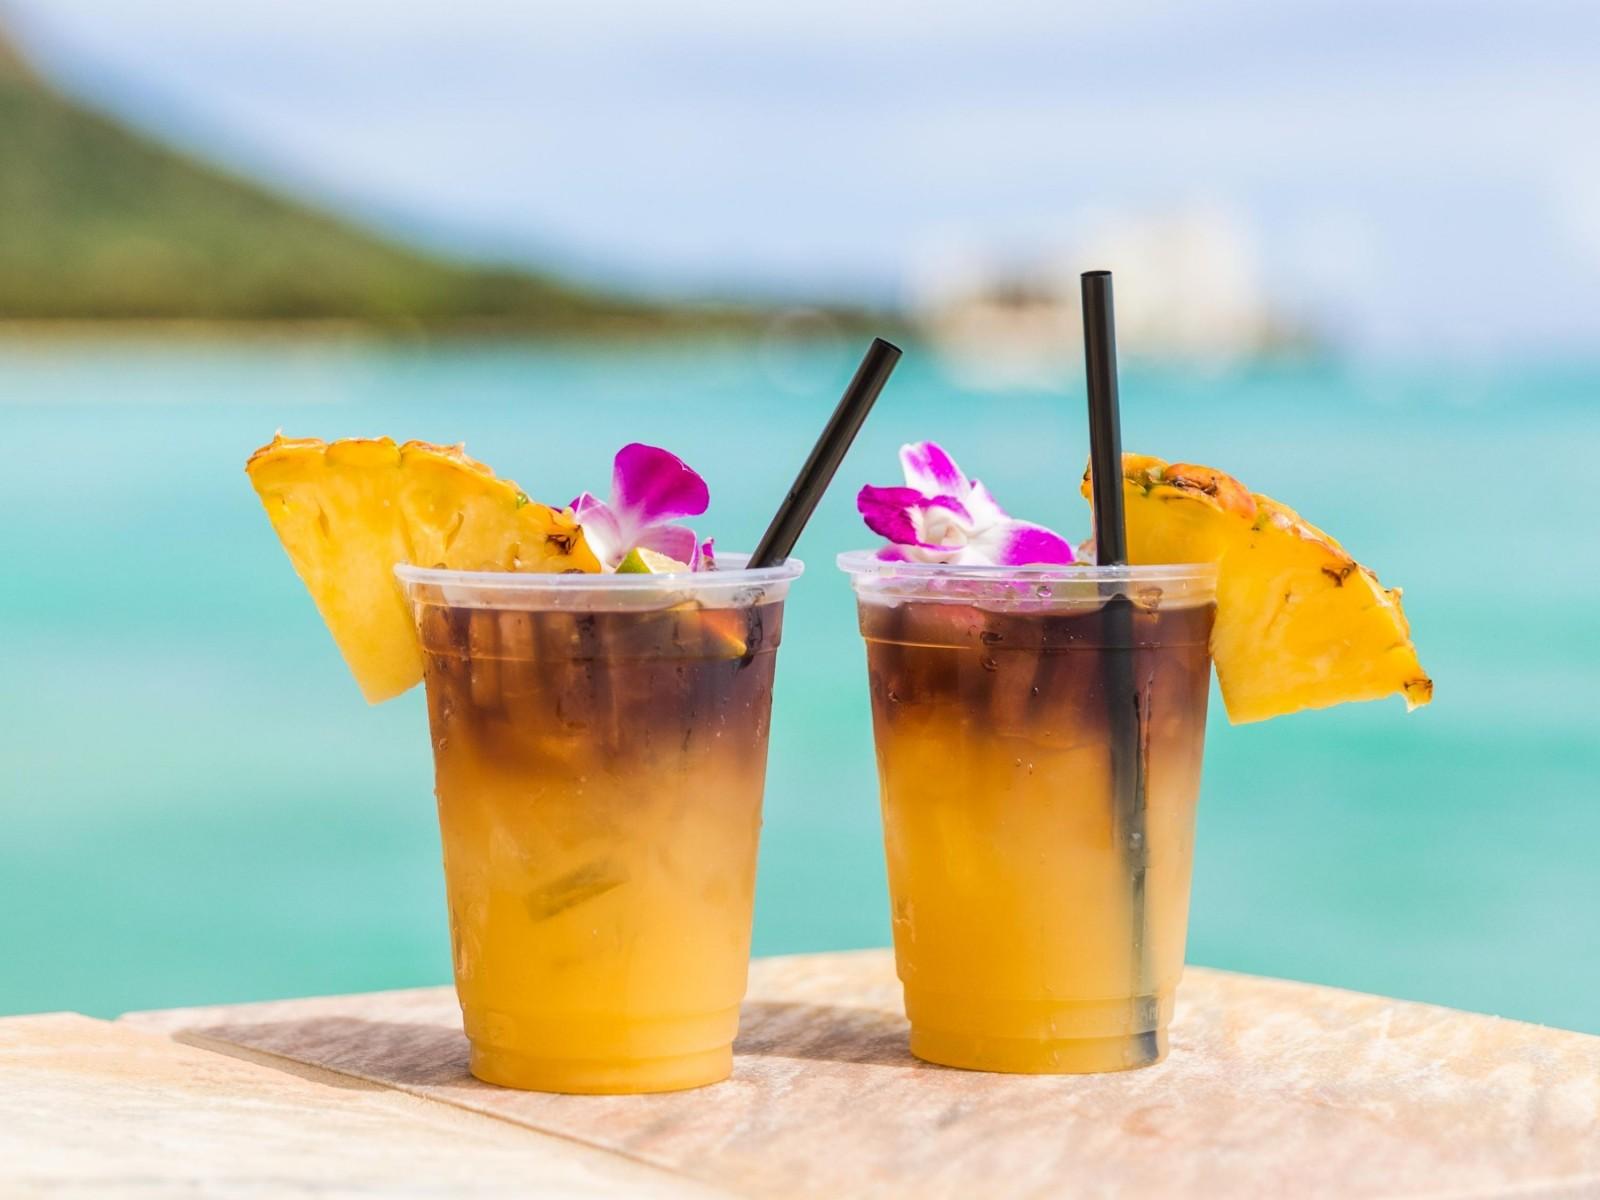 Taste of Hawaii 30時間のおこもりステイケーション